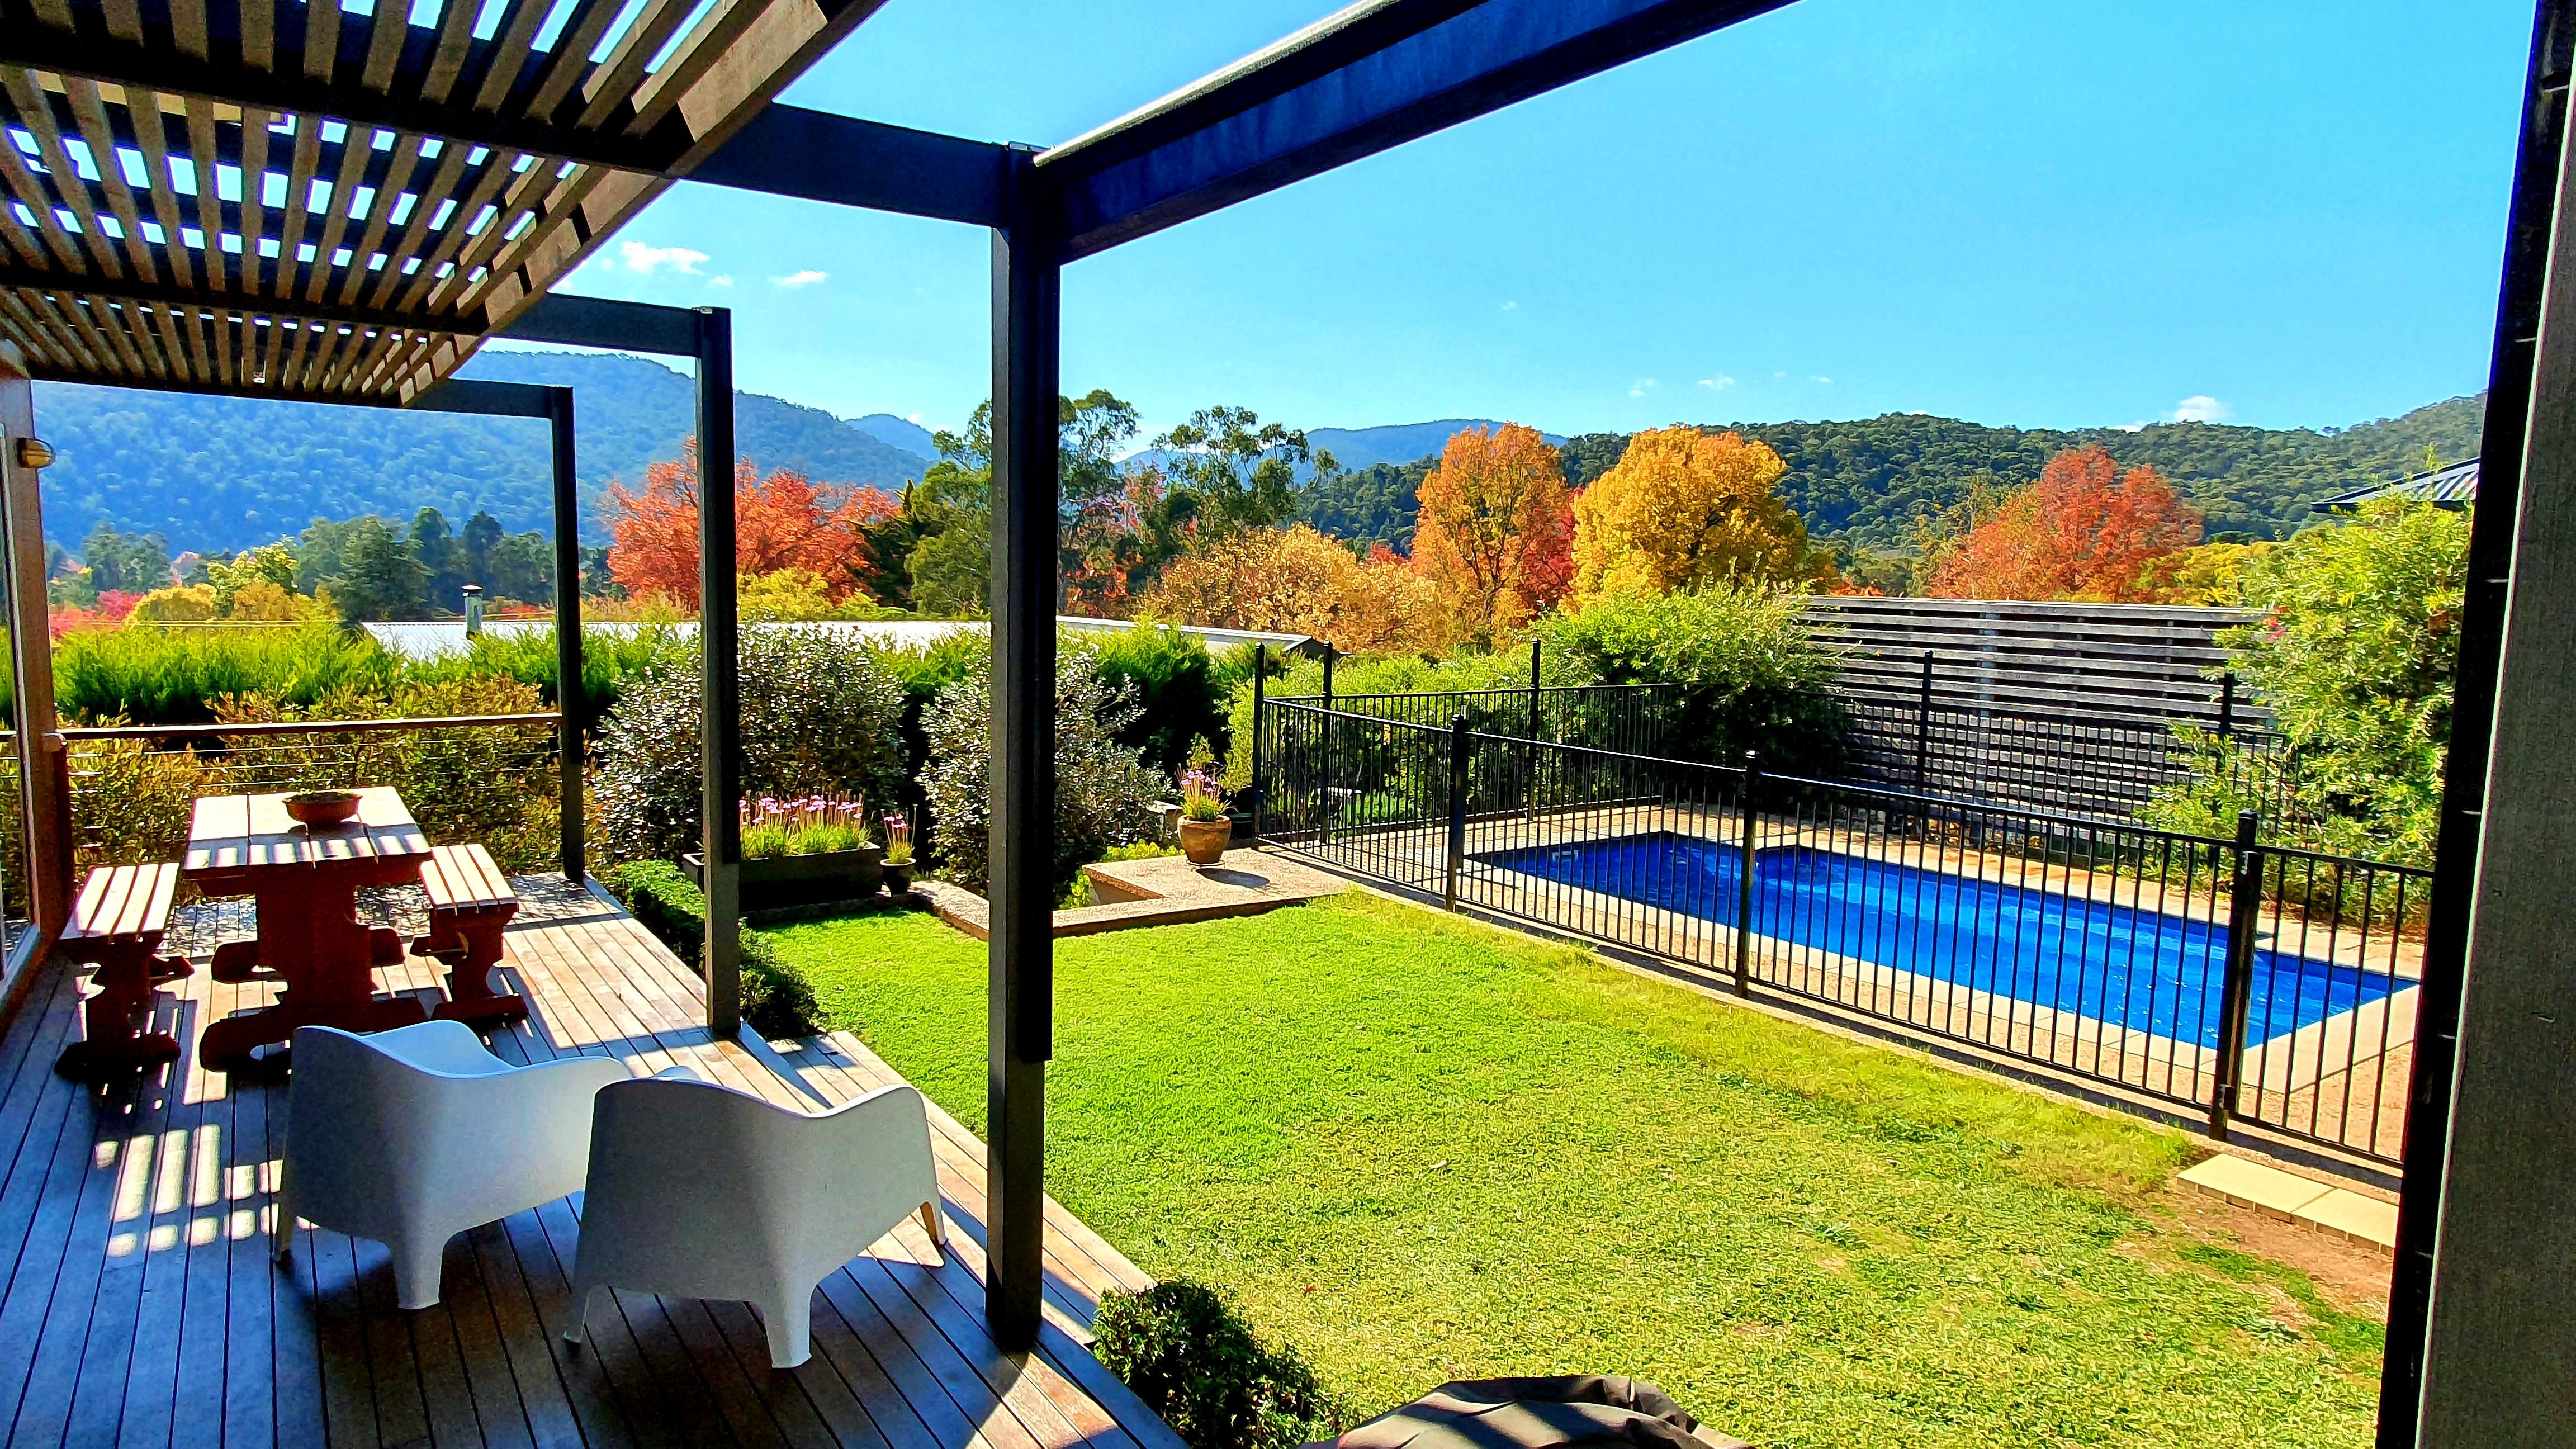 2021 autumn deck view